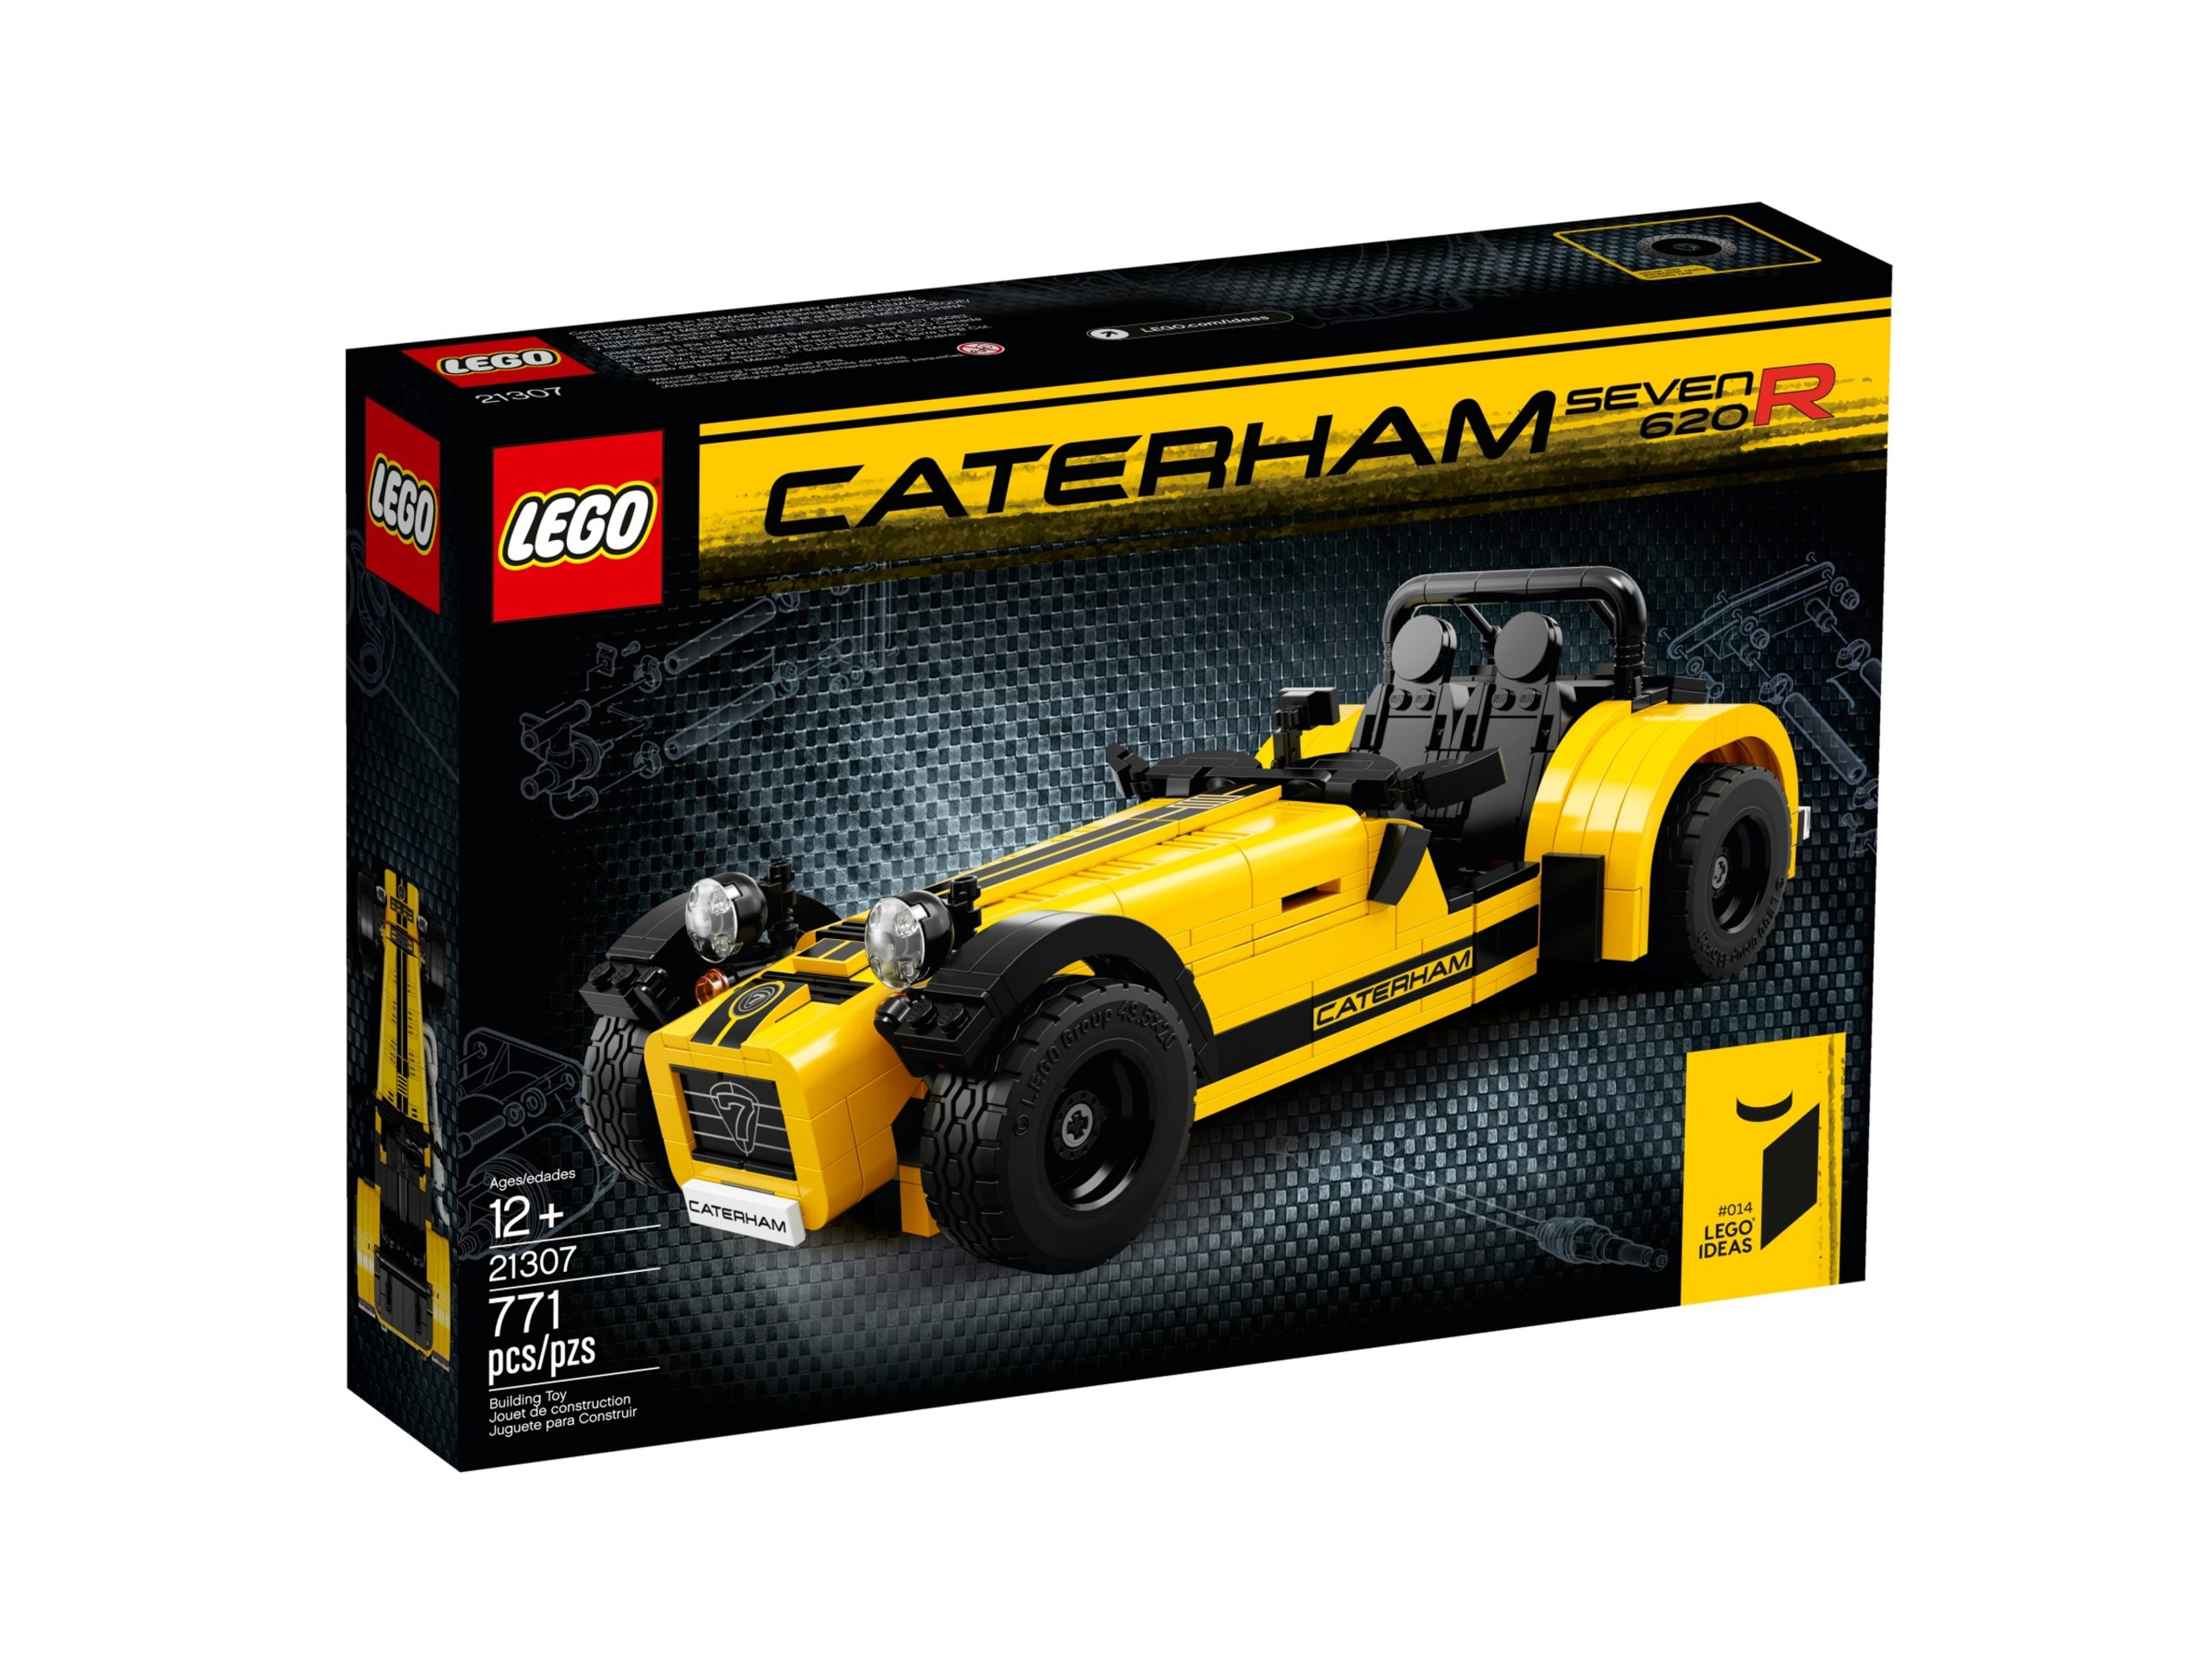 lego 21307 caterham seven 620r scaled